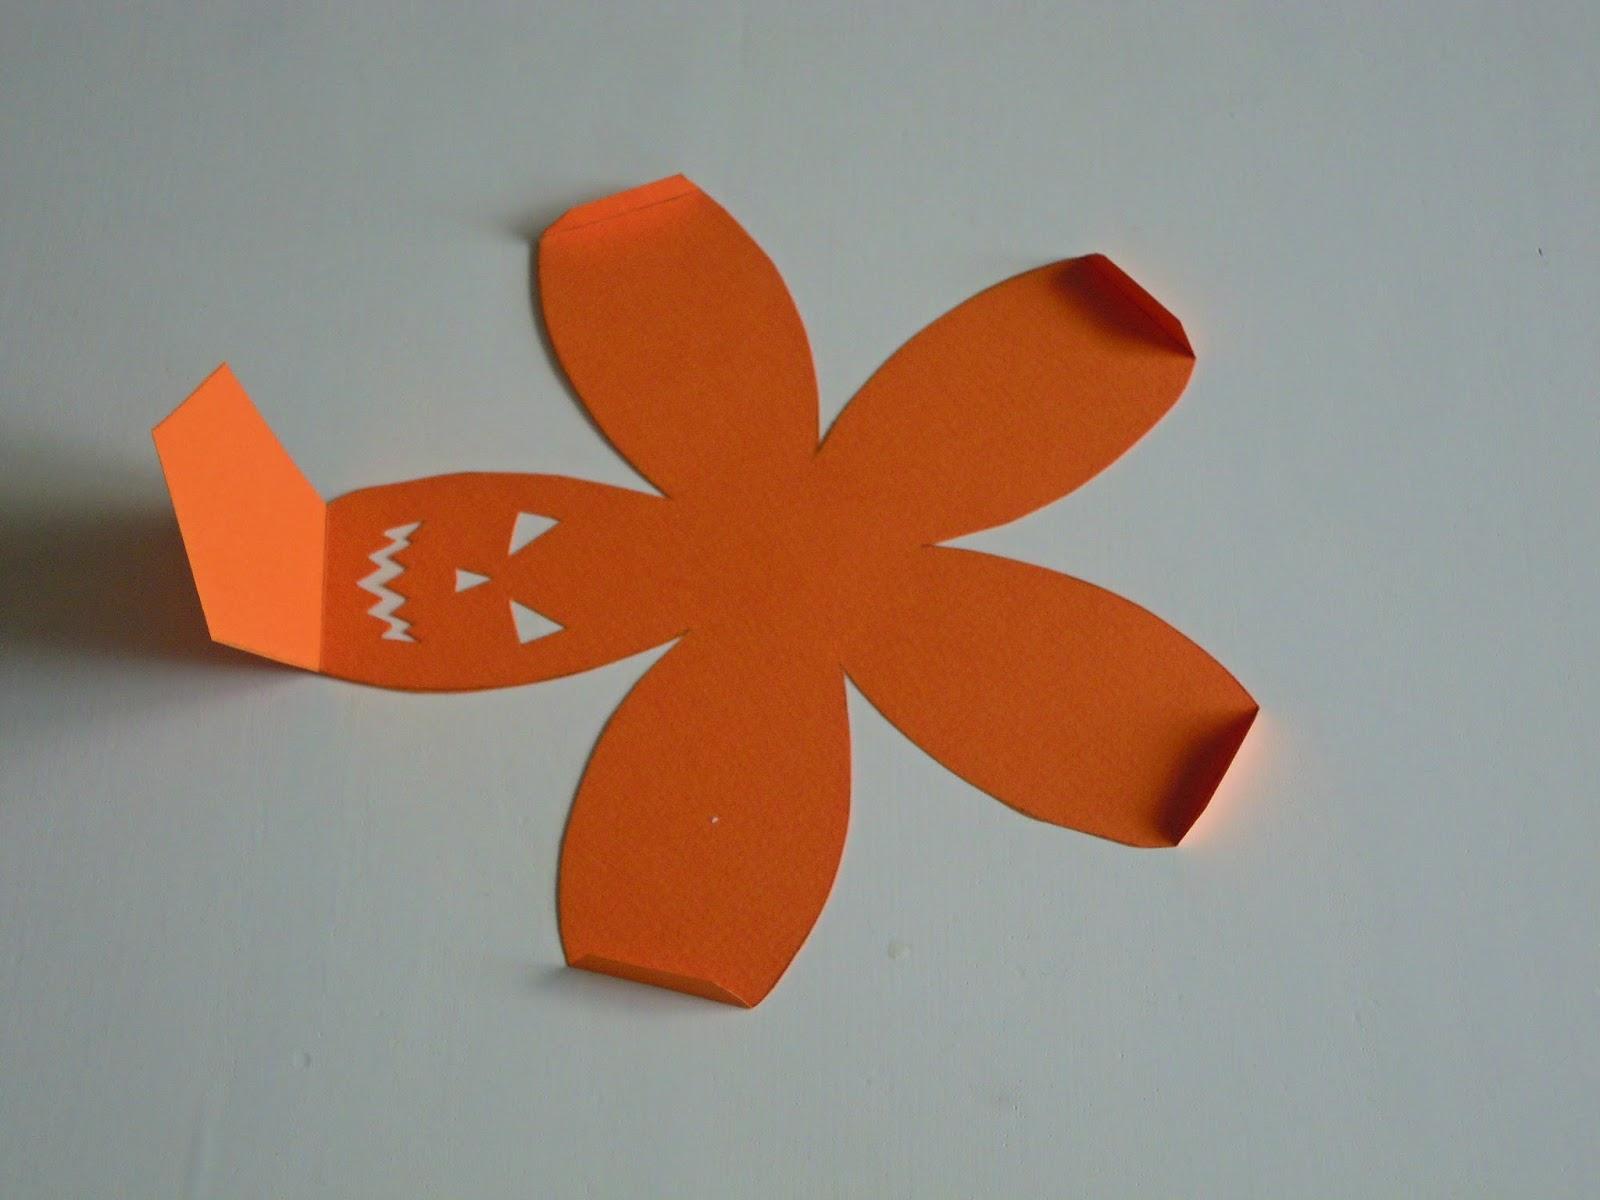 La planque libellules challenge halloween une citrouille en papier d i y - Citrouille halloween en papier ...